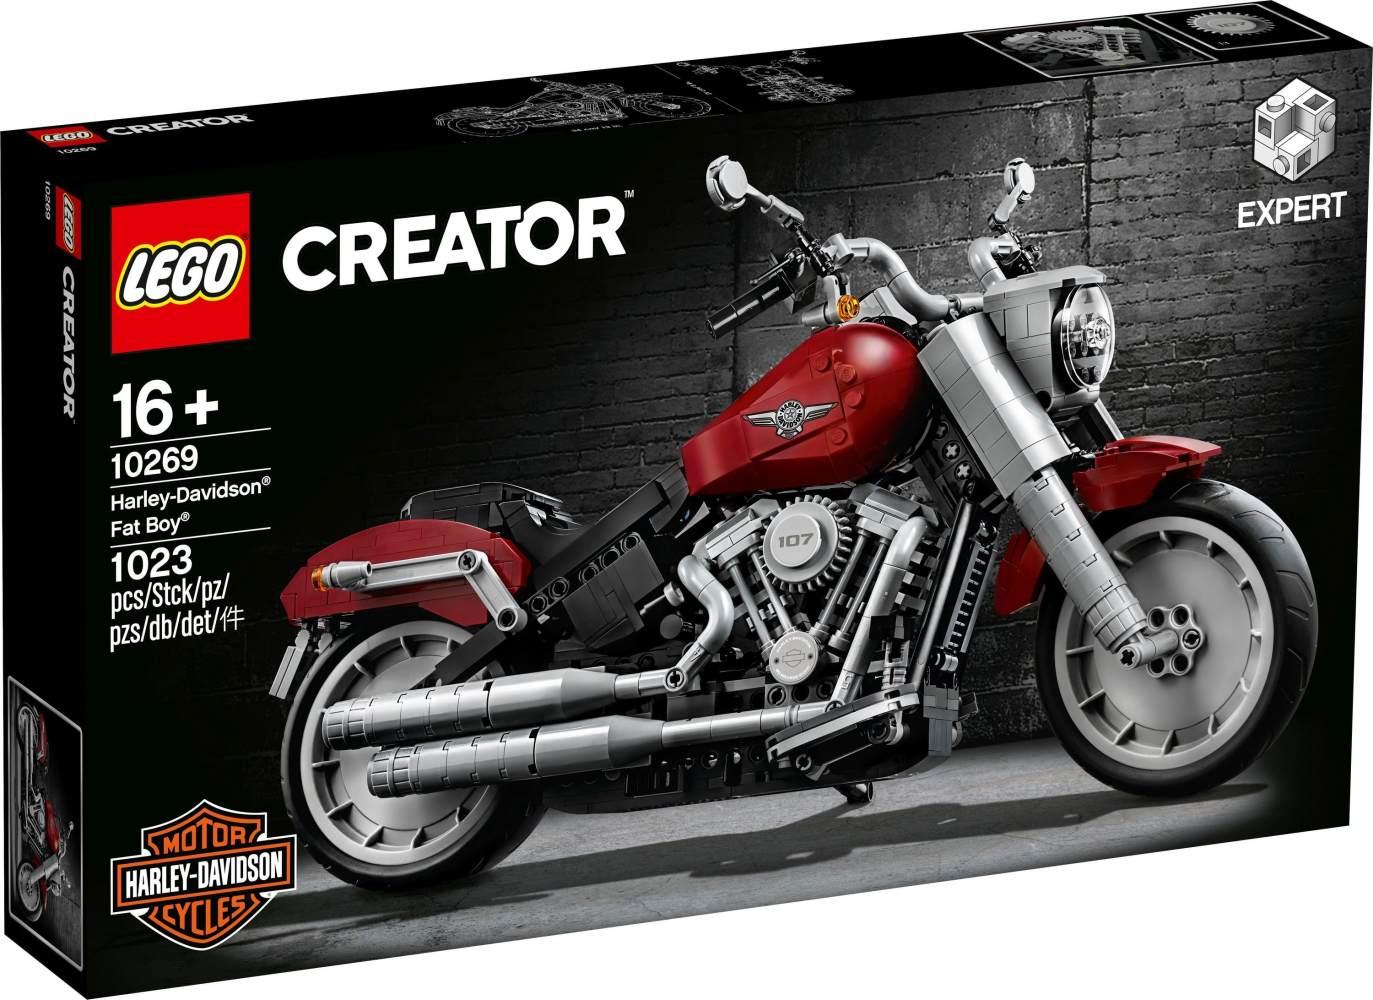 LEGO Creator Expert 10269 'Harley-Davidson® Fat Boy®', 1023 Teile, ab 16 Jahren Bild 1